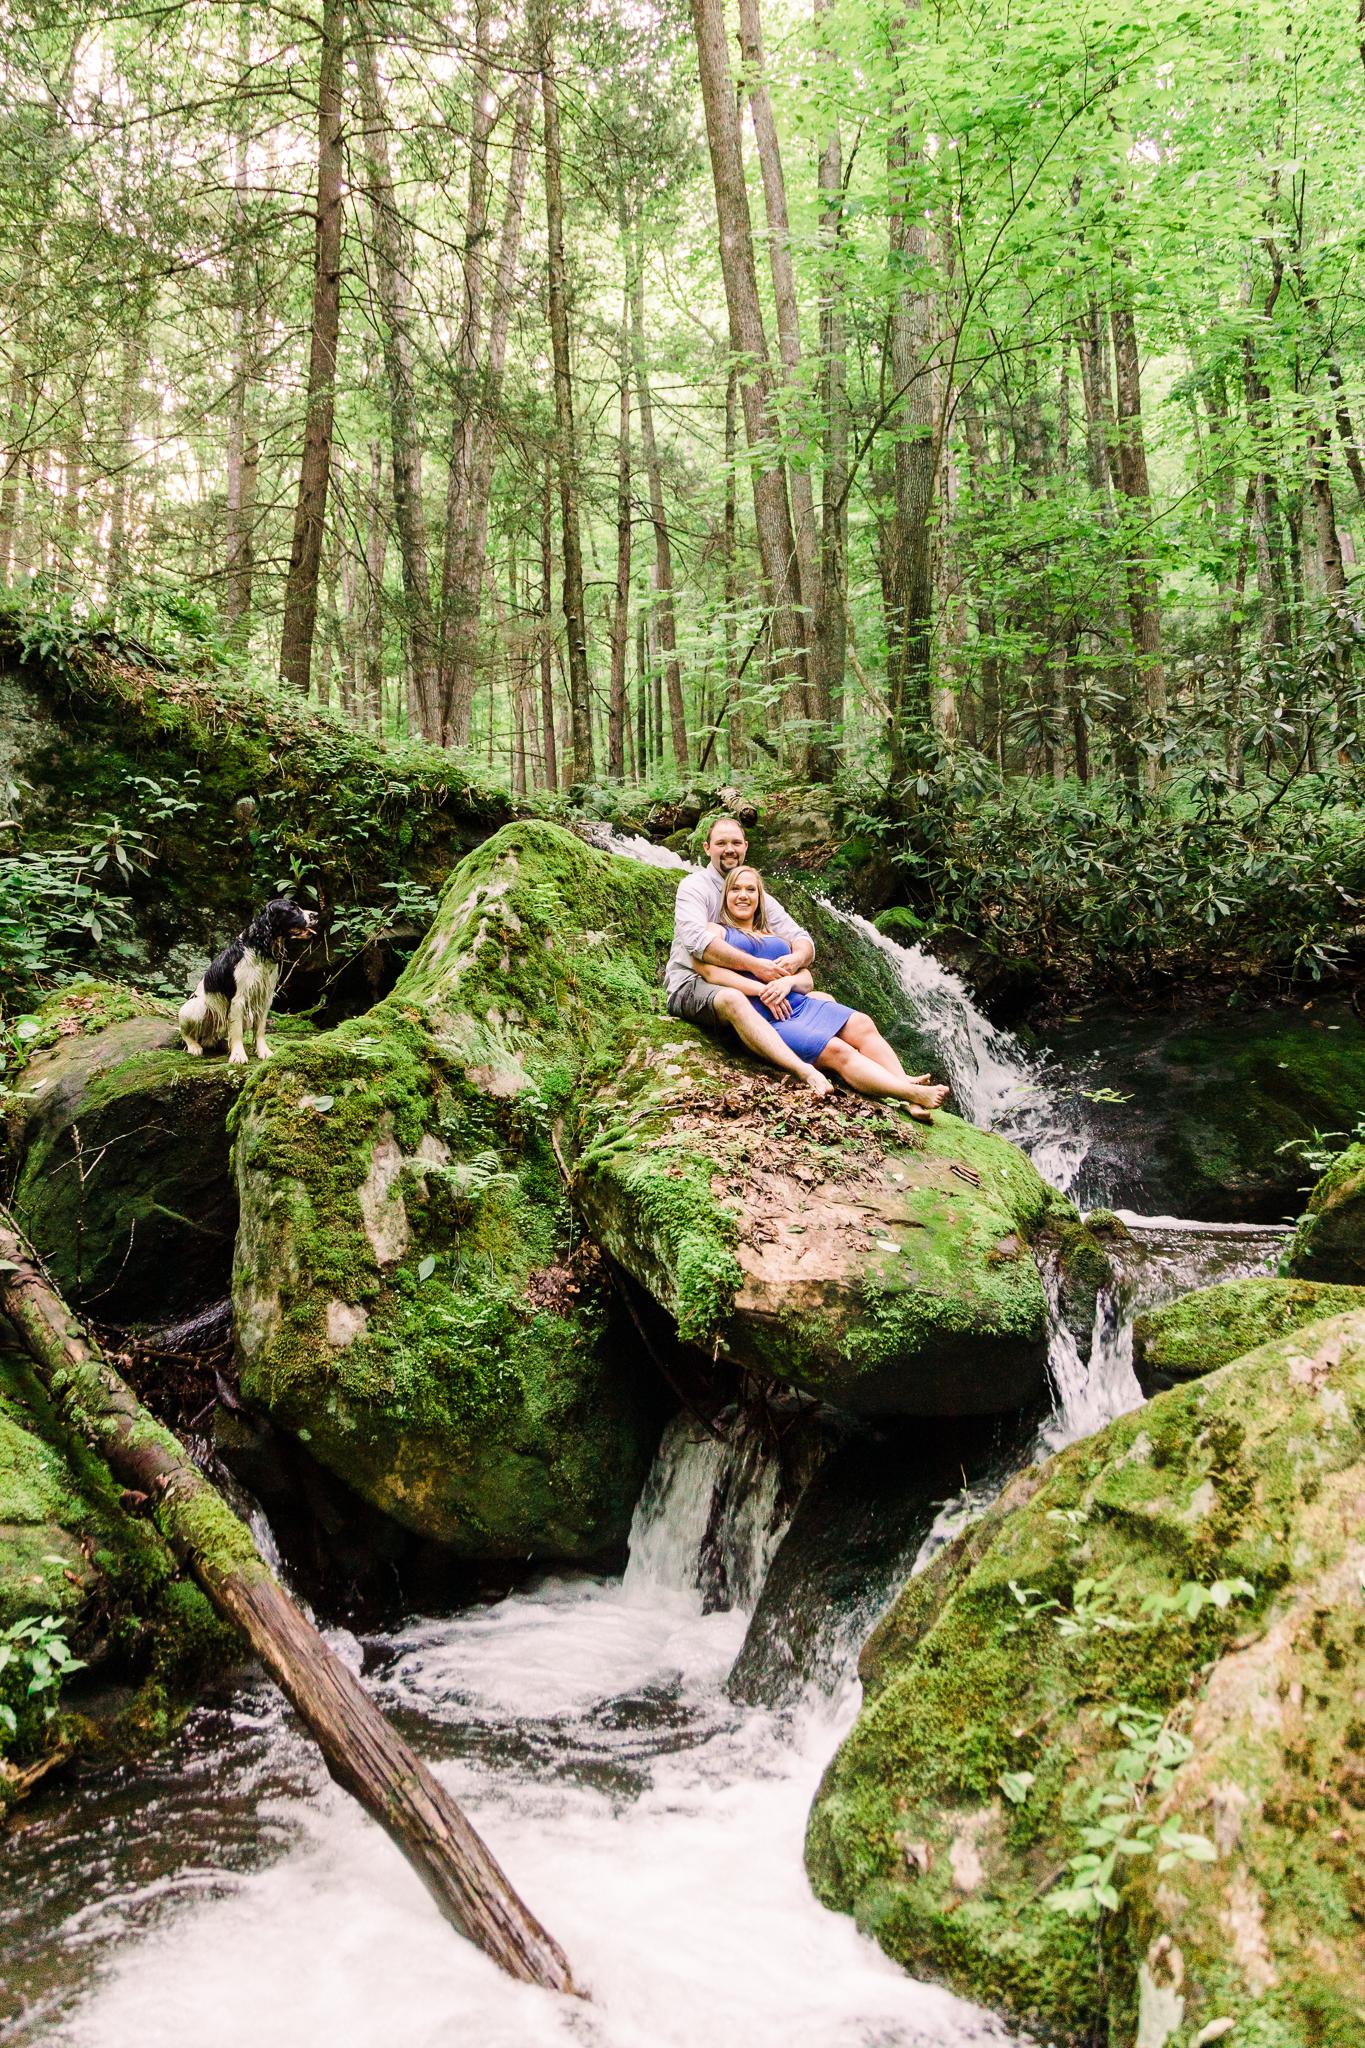 Kettle-creek-state-park-engagement-9214.jpg